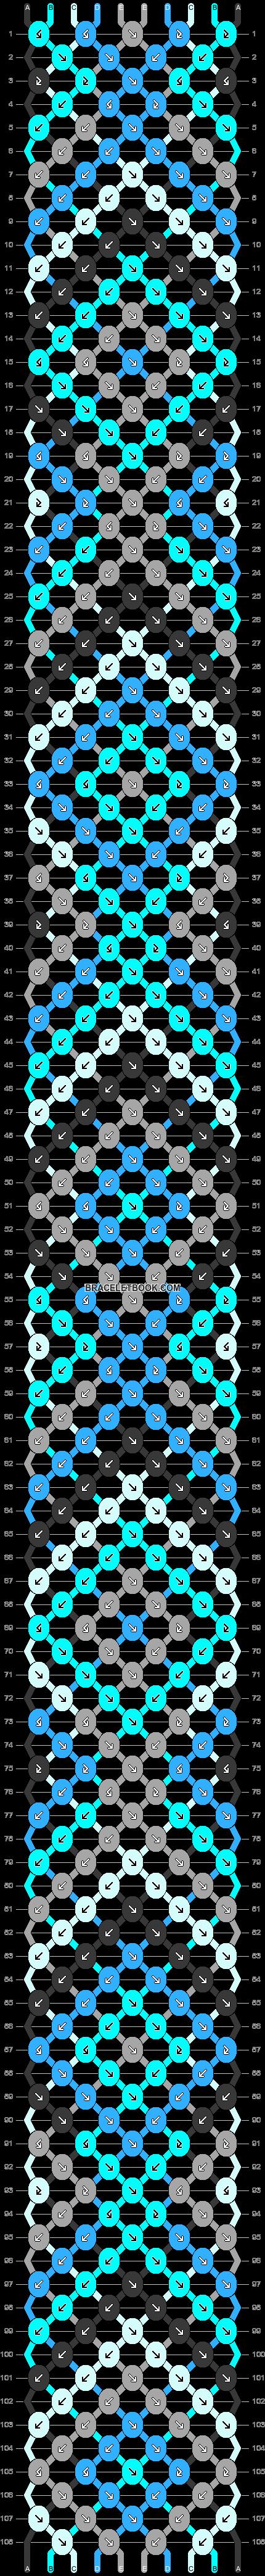 Normal pattern #85911 pattern